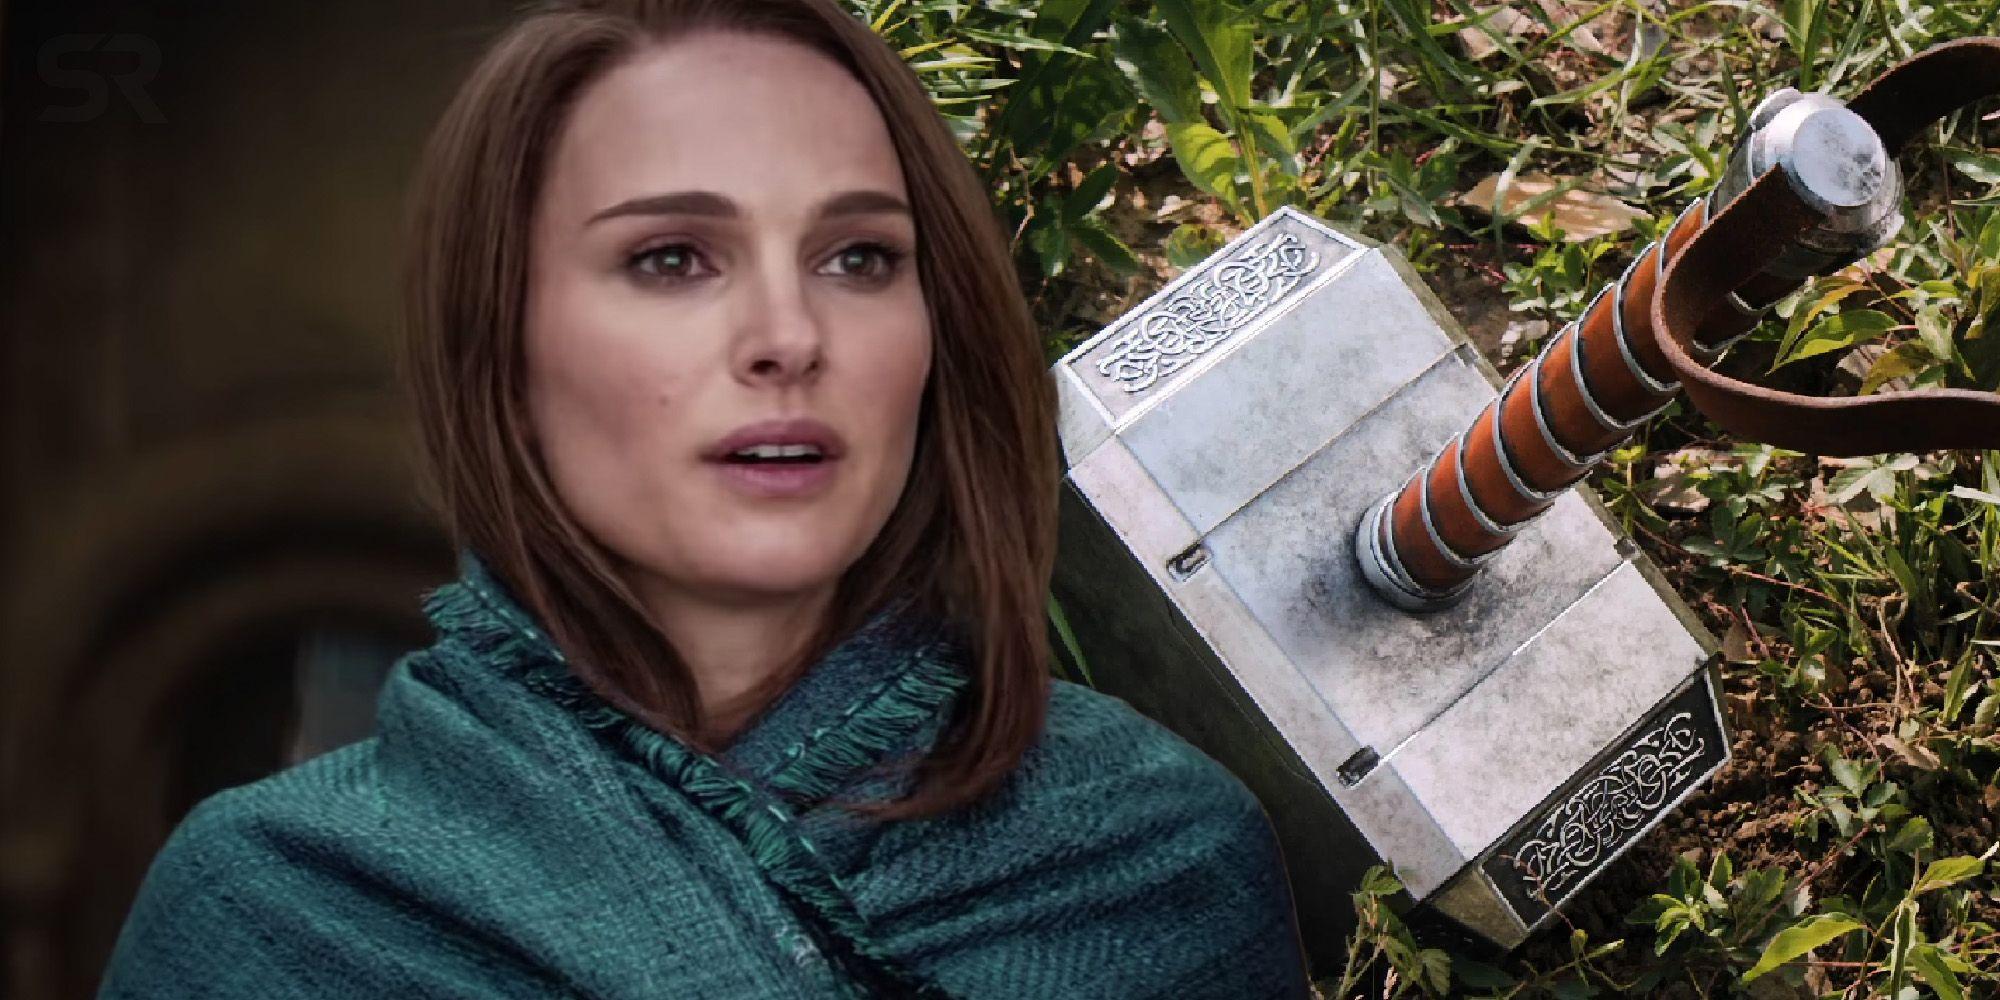 Thor 4: Natalie Portman Confirms Jane Will Wield Mjolnir In Love & Thunder